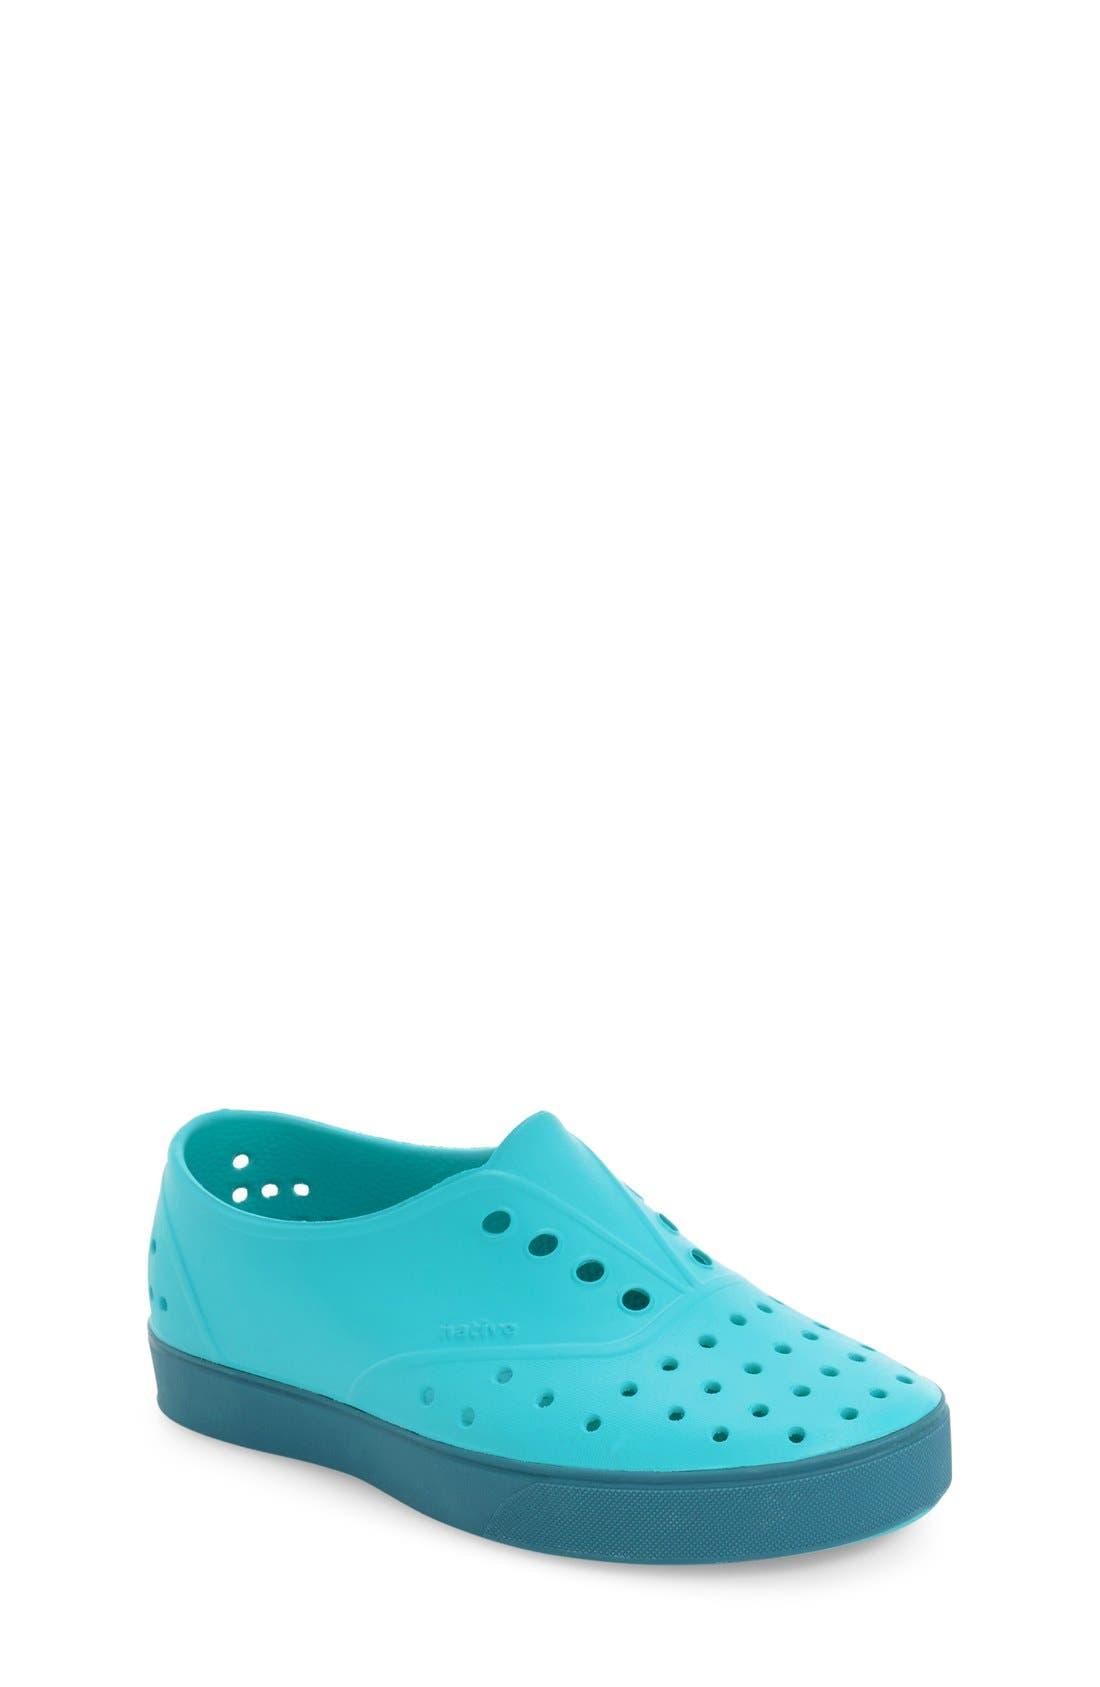 Miller Water Friendly Slip-On Sneaker,                             Main thumbnail 21, color,